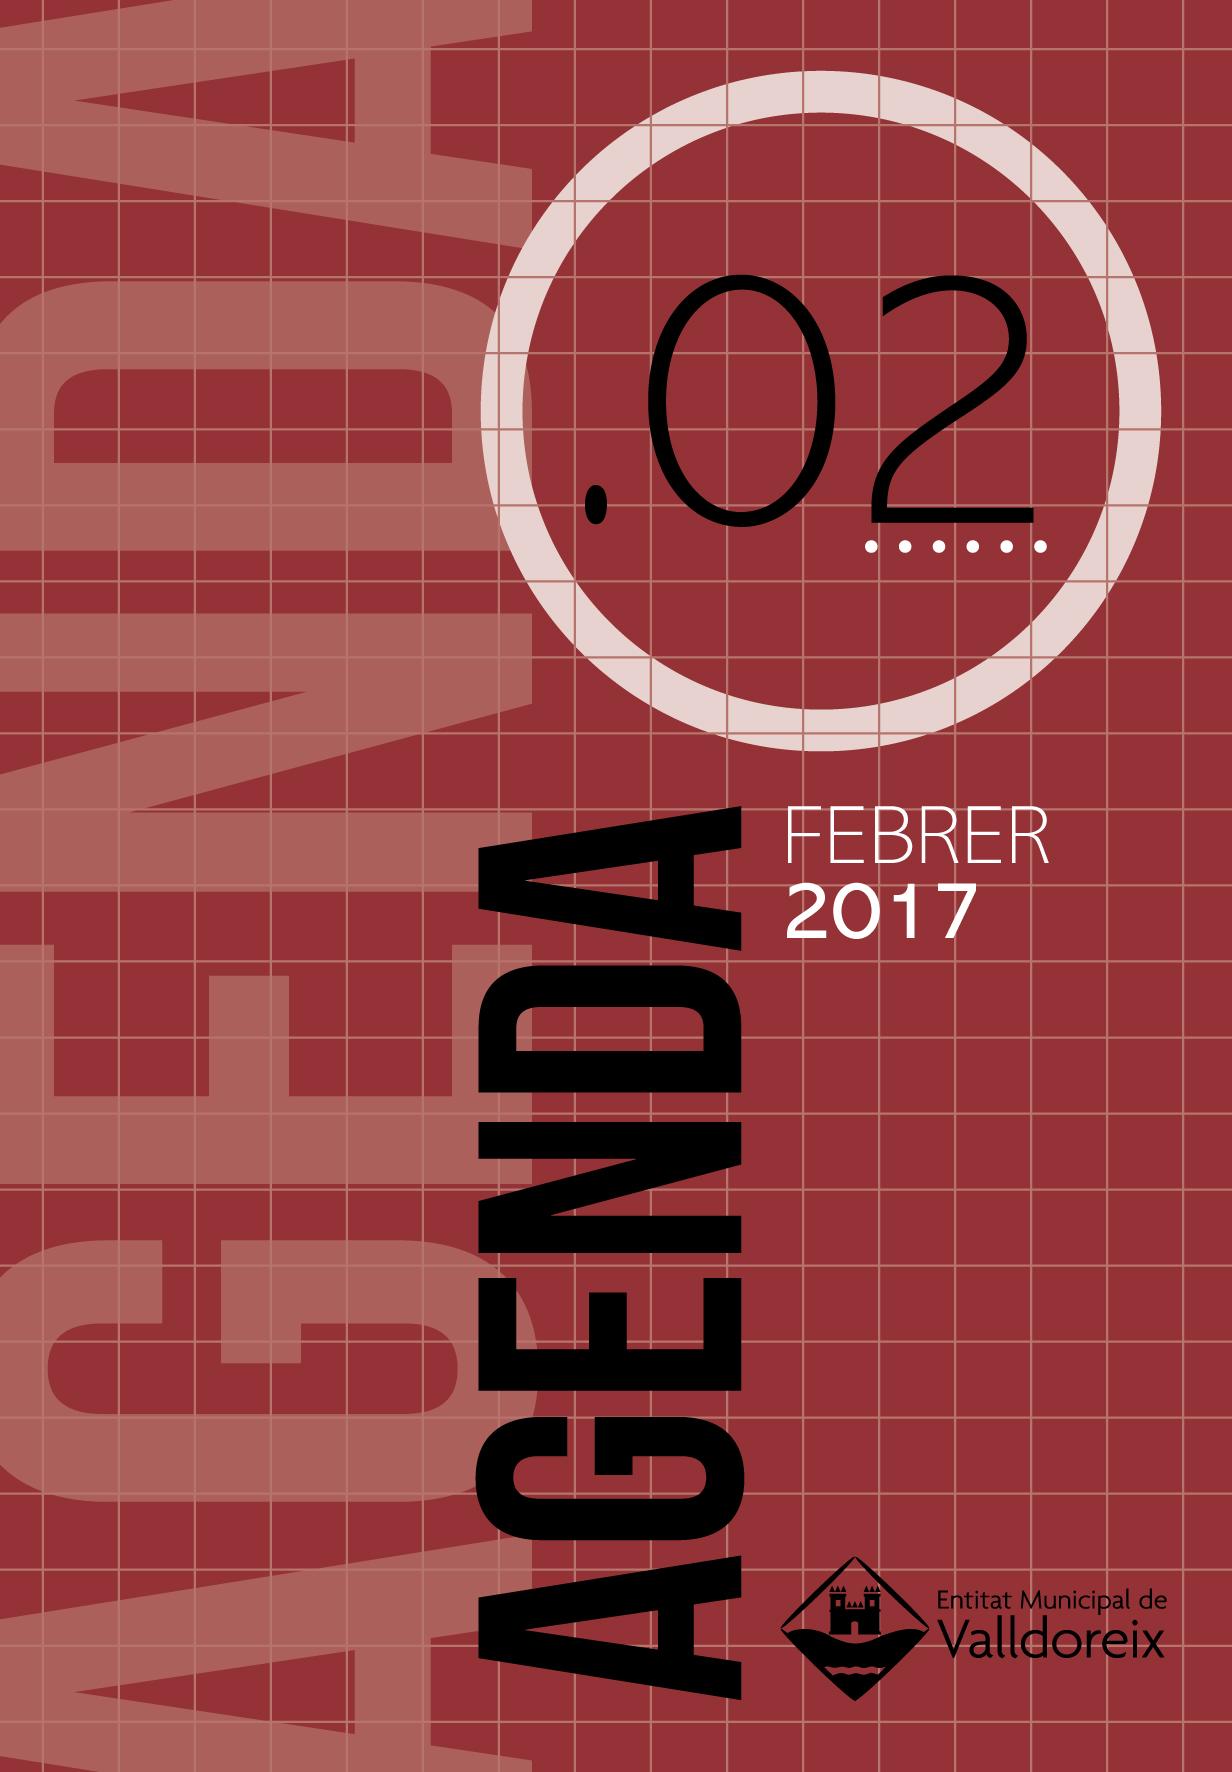 AGENDA FEB'17